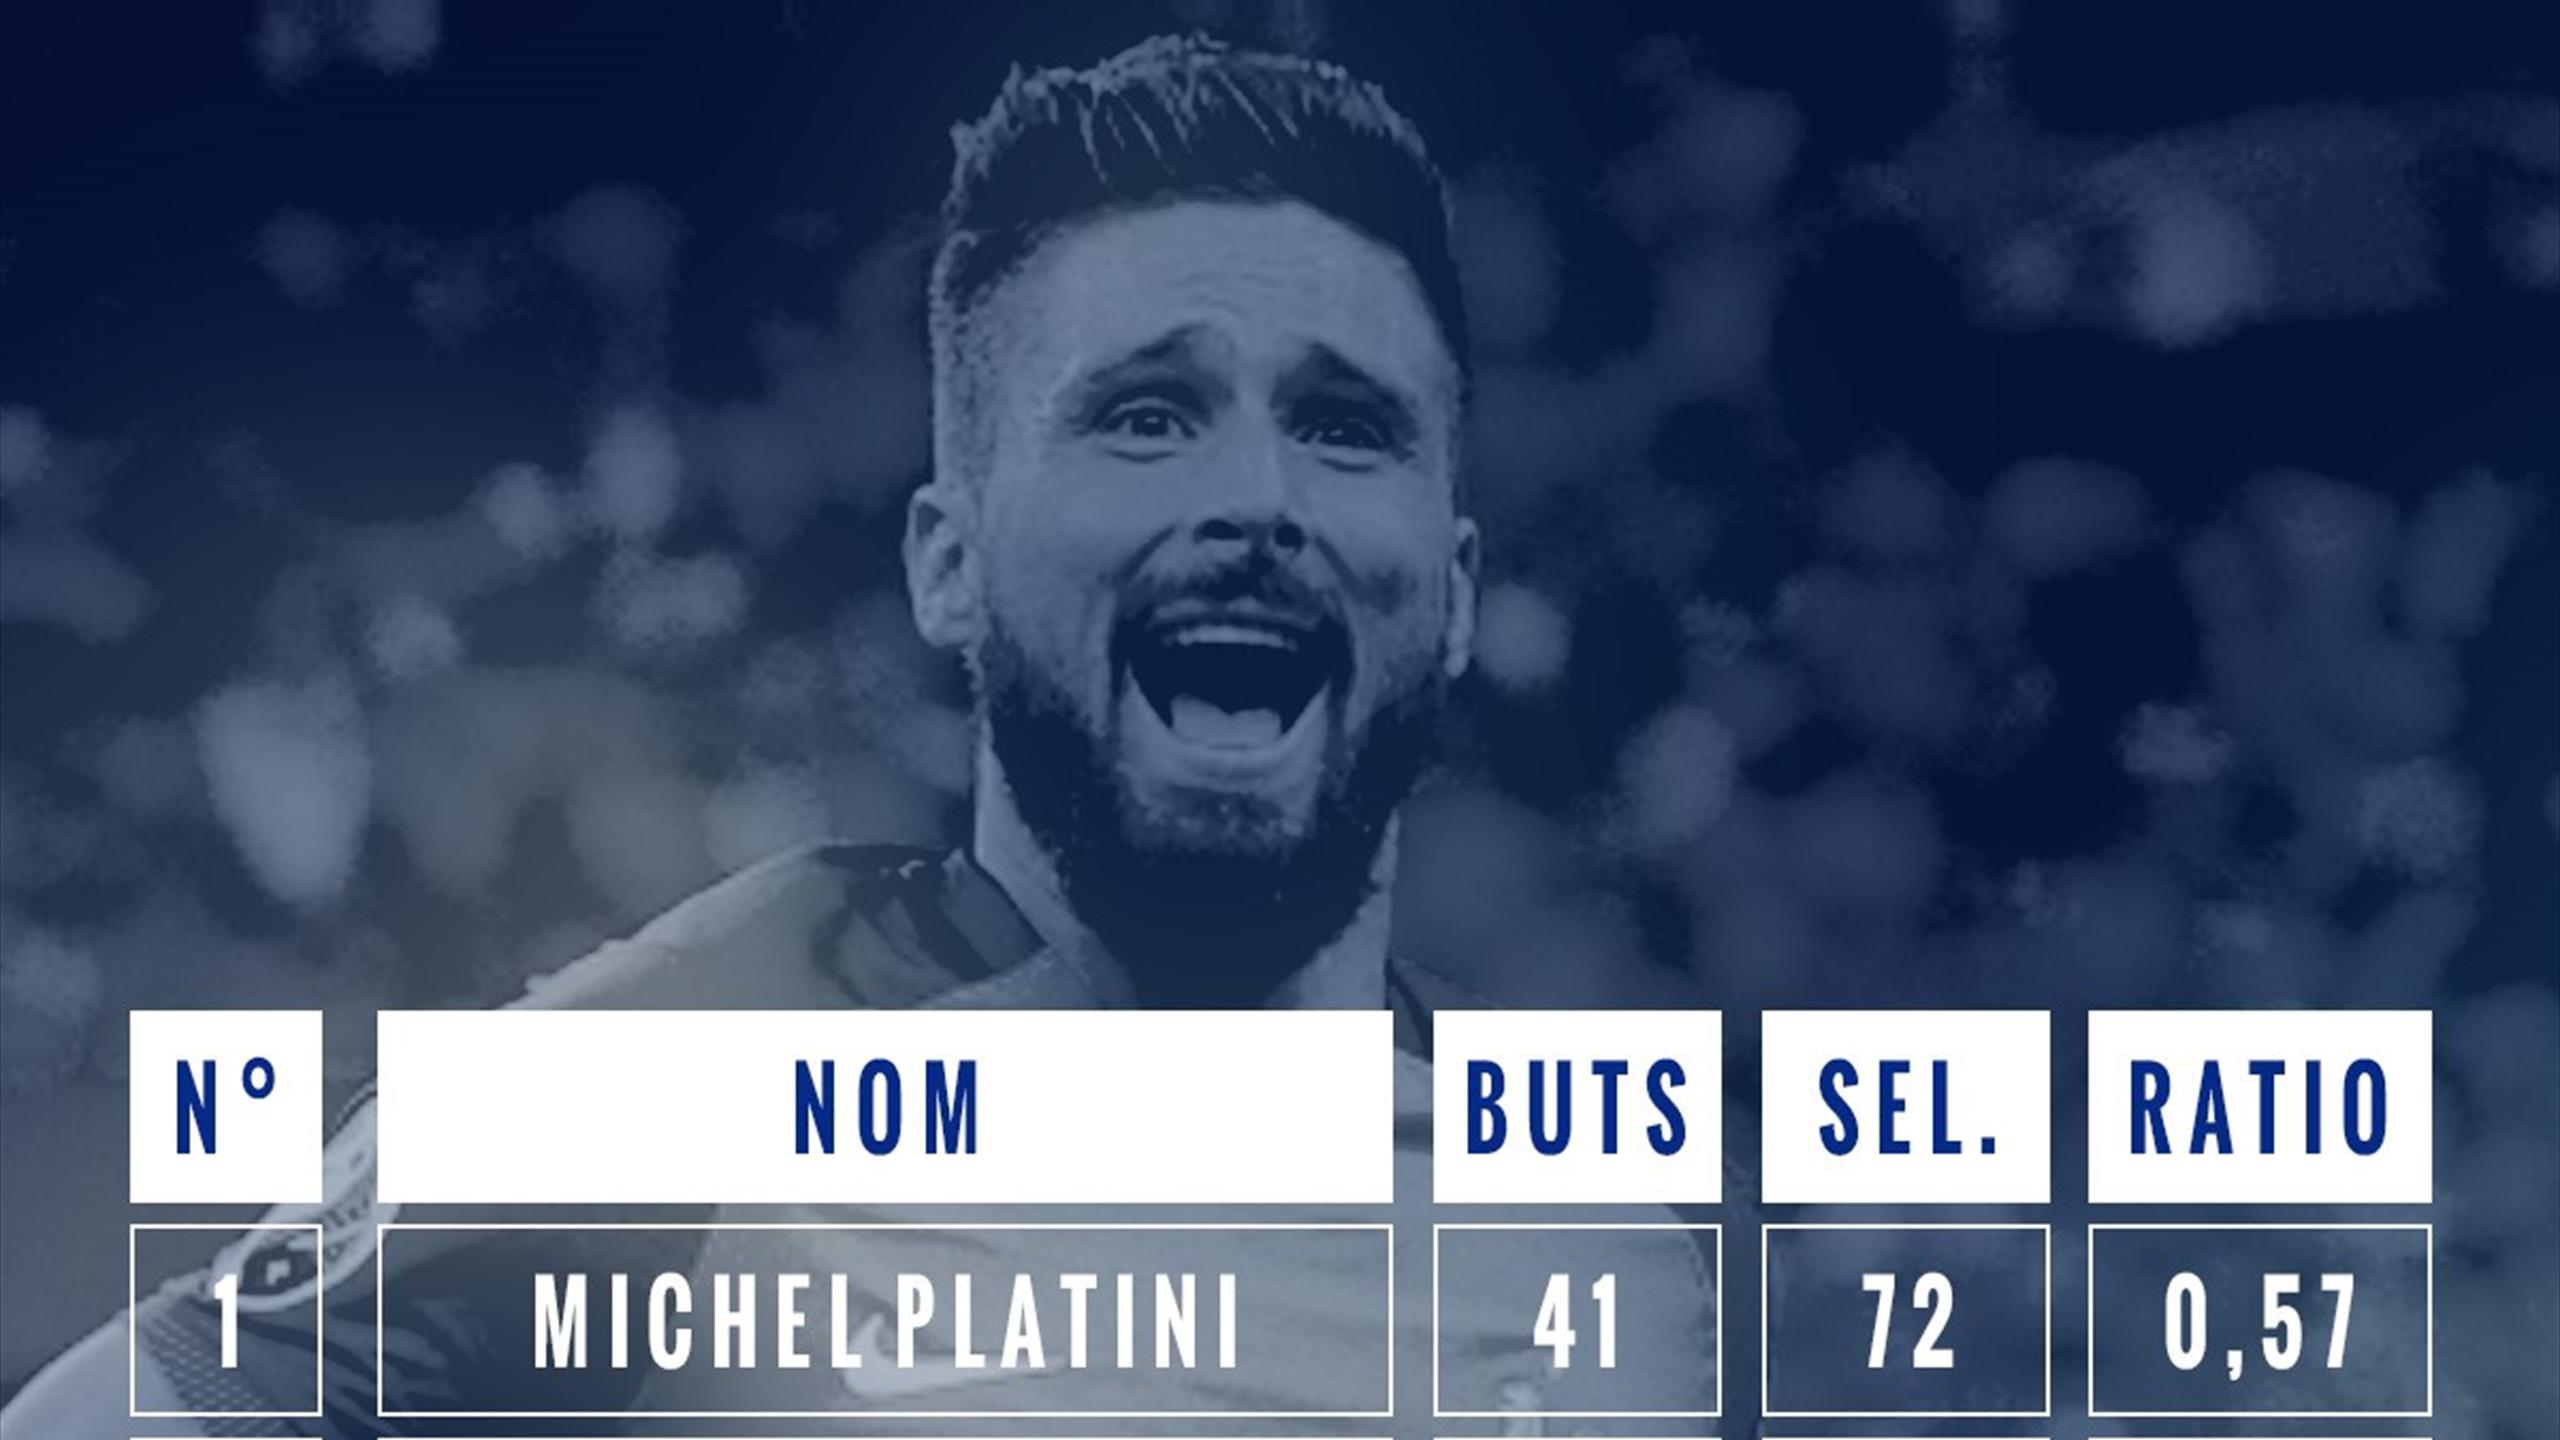 Giroud tableau stats